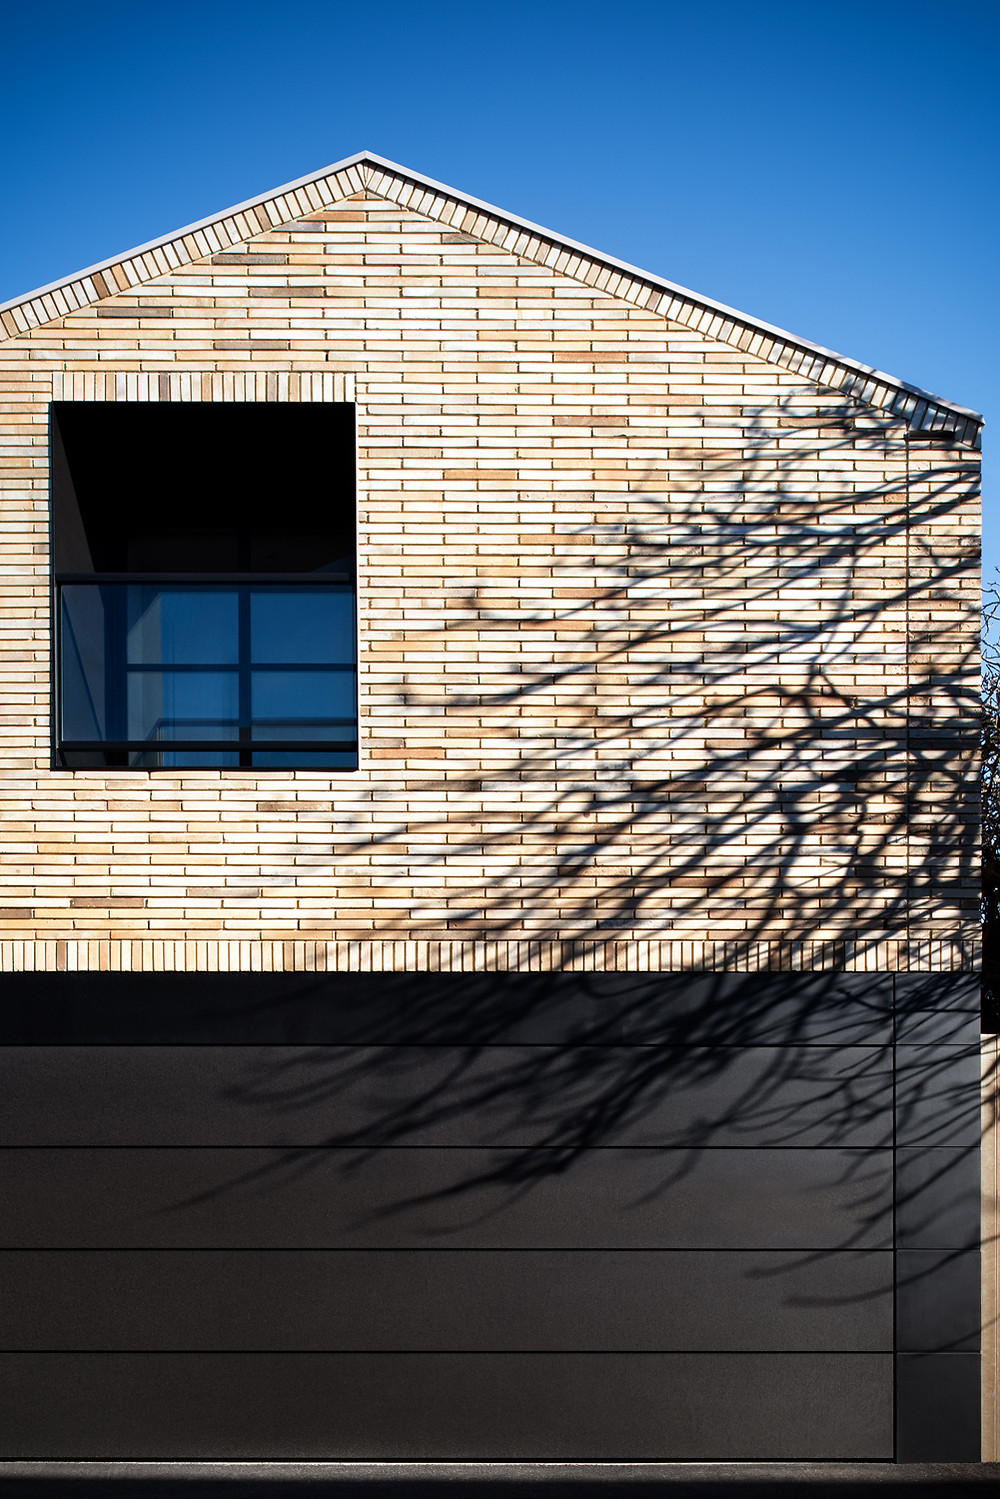 Krause Bricks, Emperor Blend, Gallery House, Fitzroy